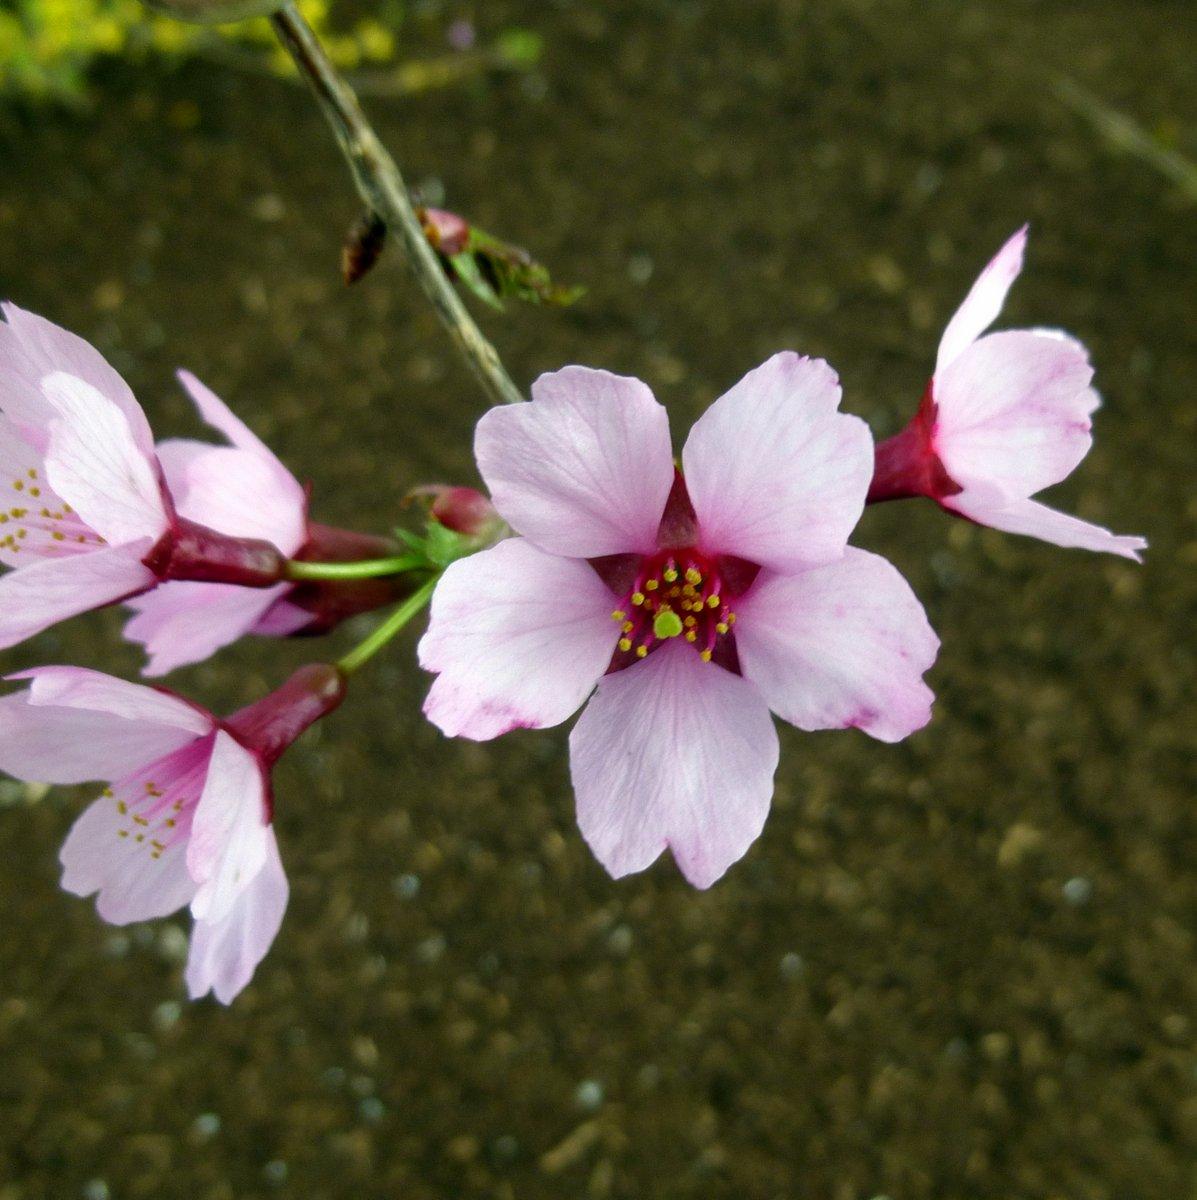 3. Cherry Blossoms